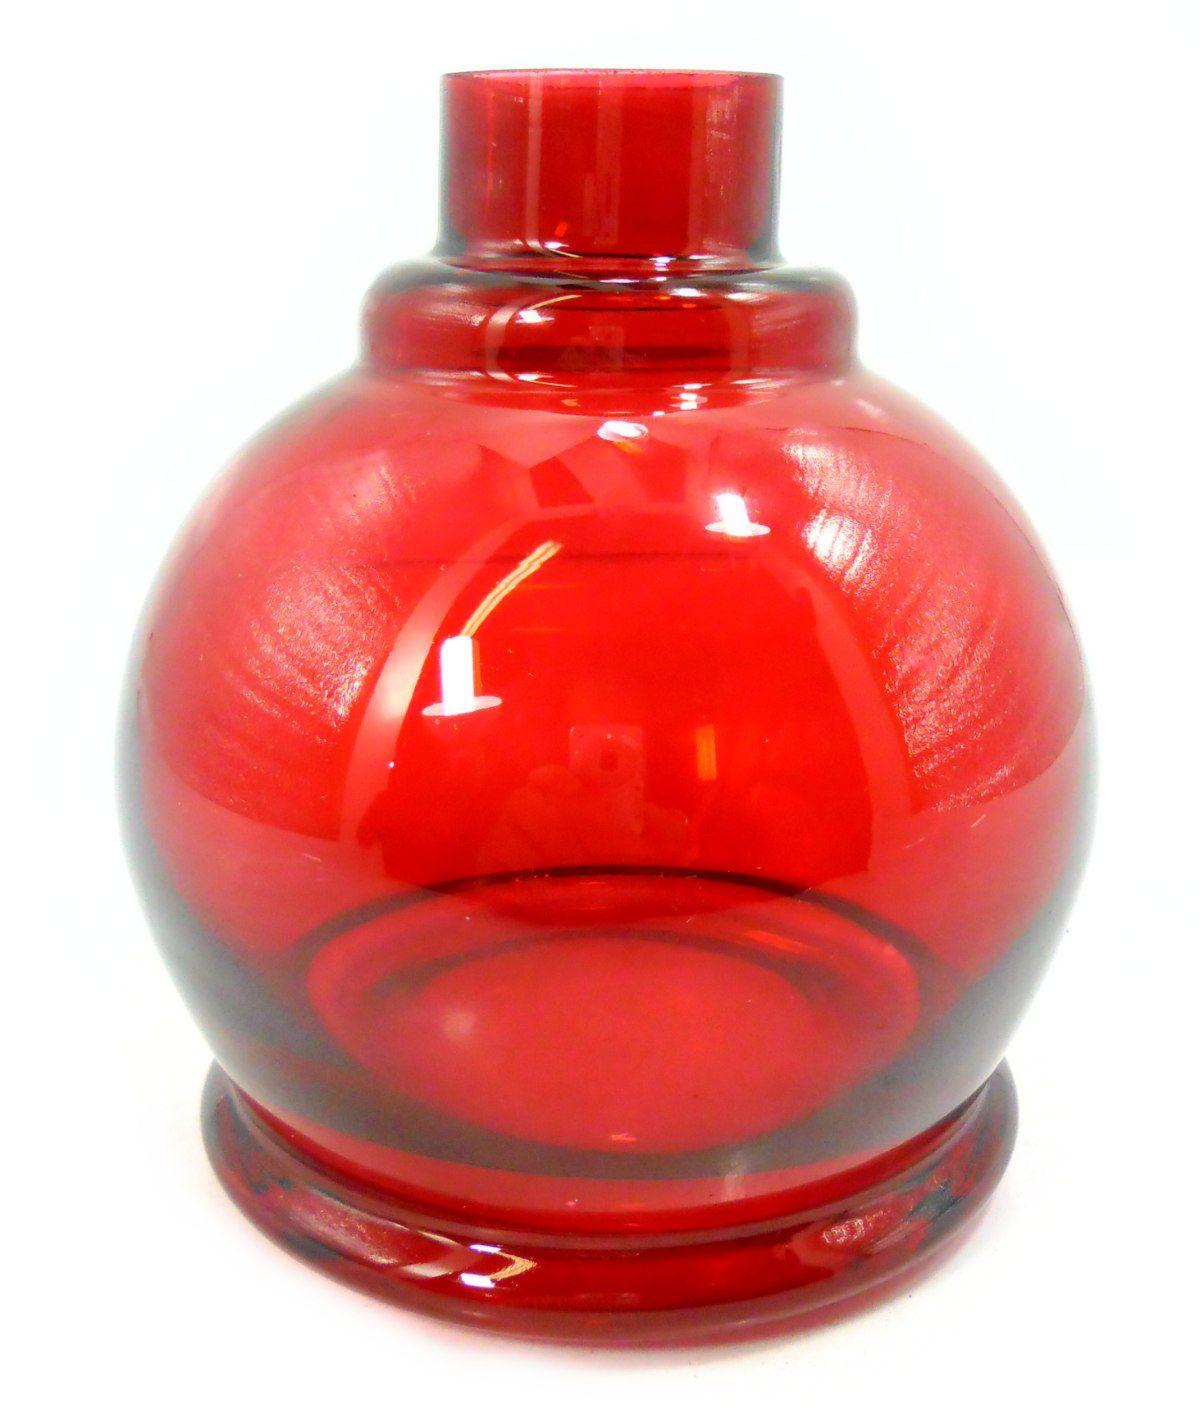 Vaso/base para narguile Luna Ball. 13cm altura e 3,8cm diâmetro de bocal. Encaixe macho (interno).